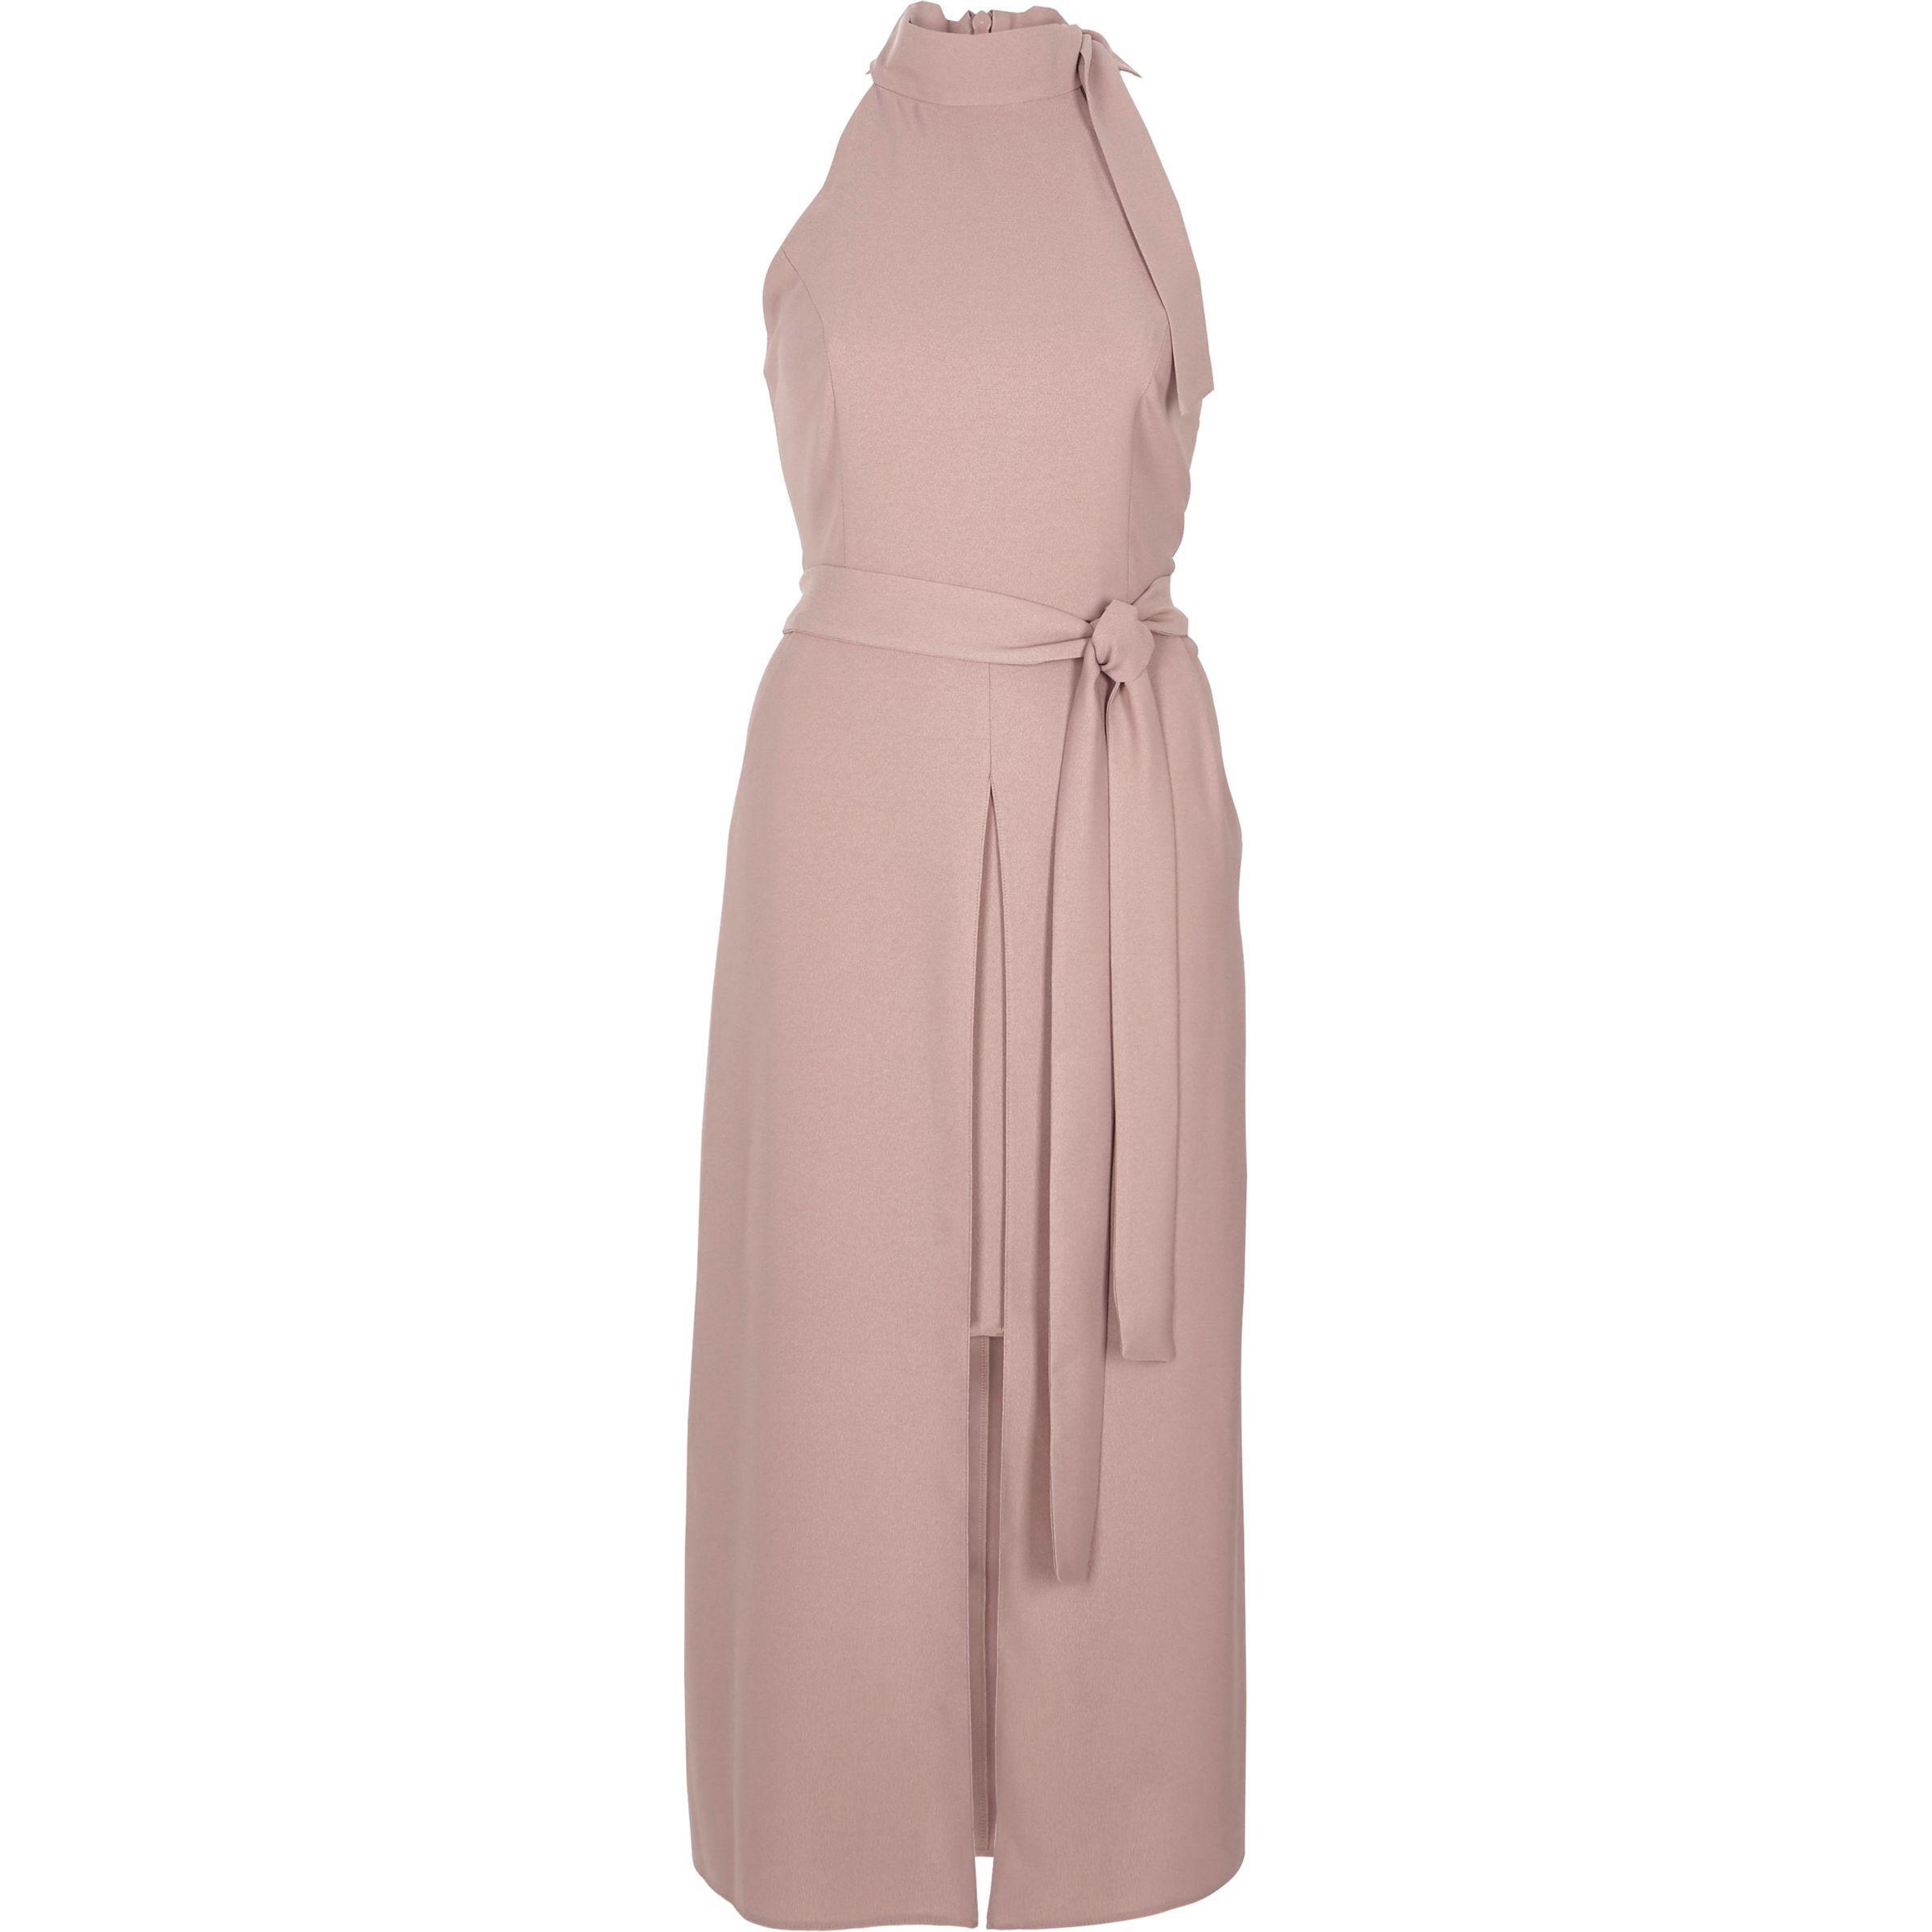 b2698355e2 River Island Pink Tie Neck Sleeveless Midi Dress in Pink - Lyst